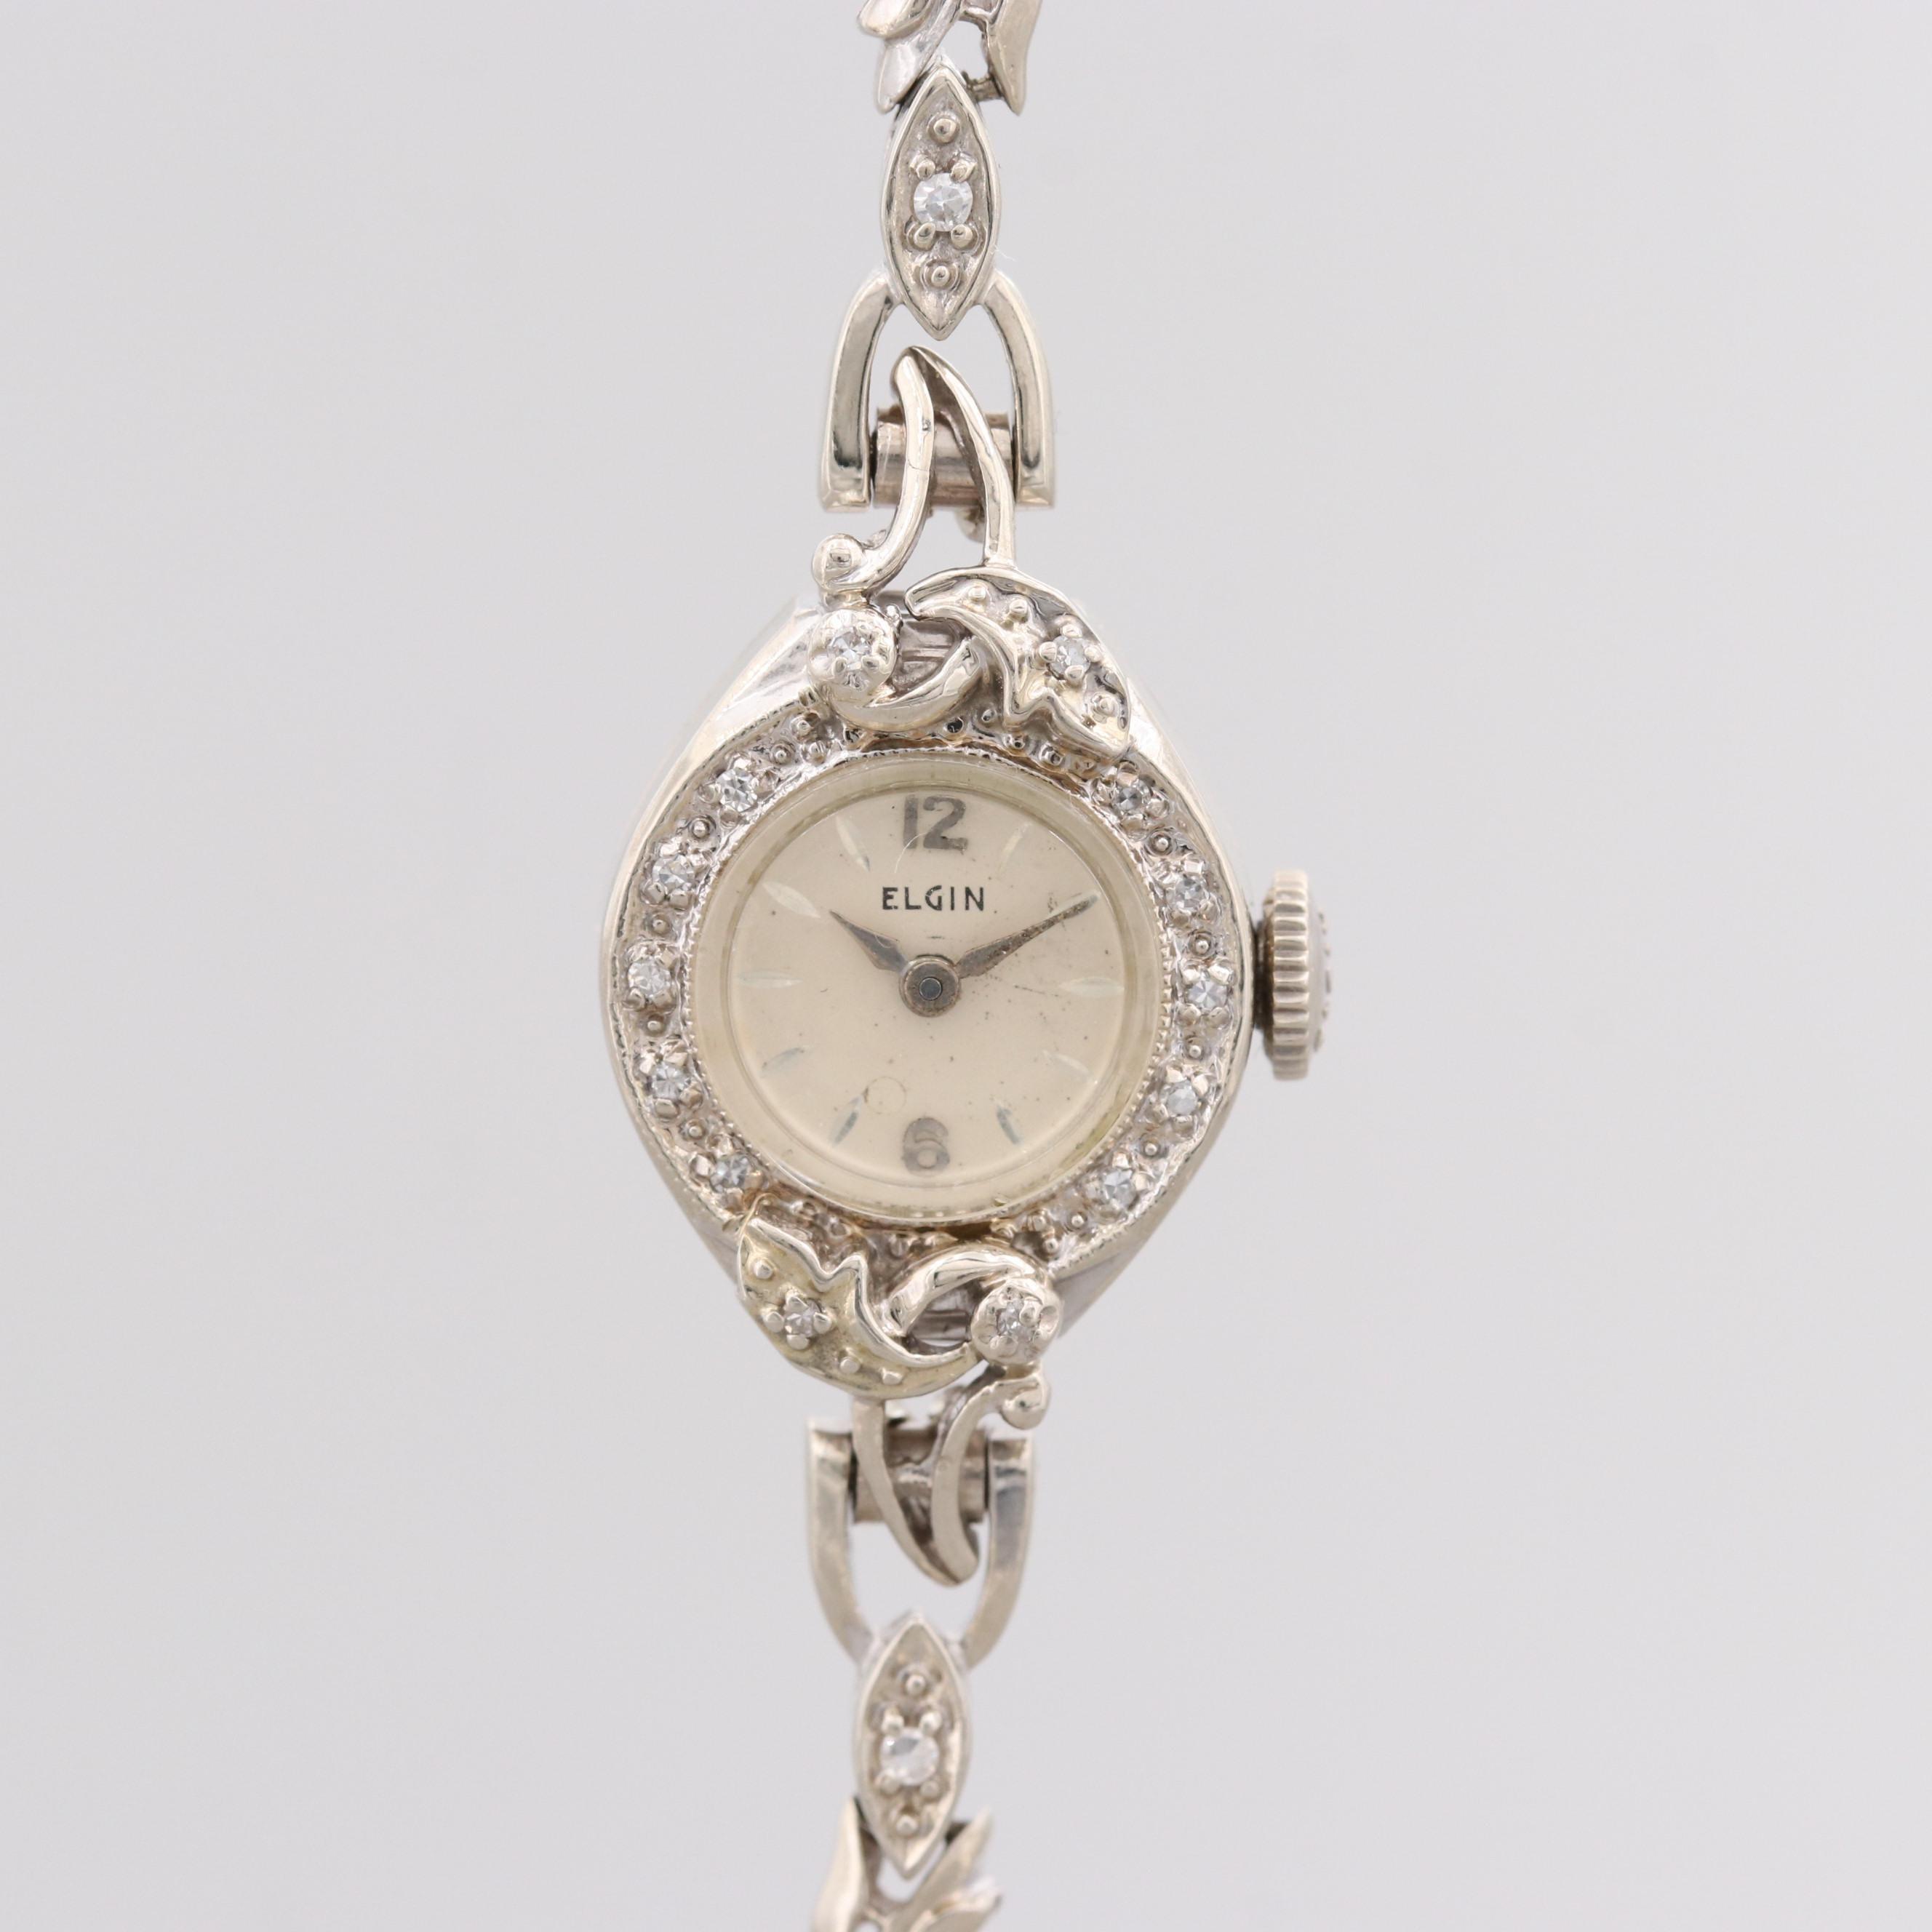 Elgin 14K White Gold Wristwatch With Diamond Bezel and Bracelet